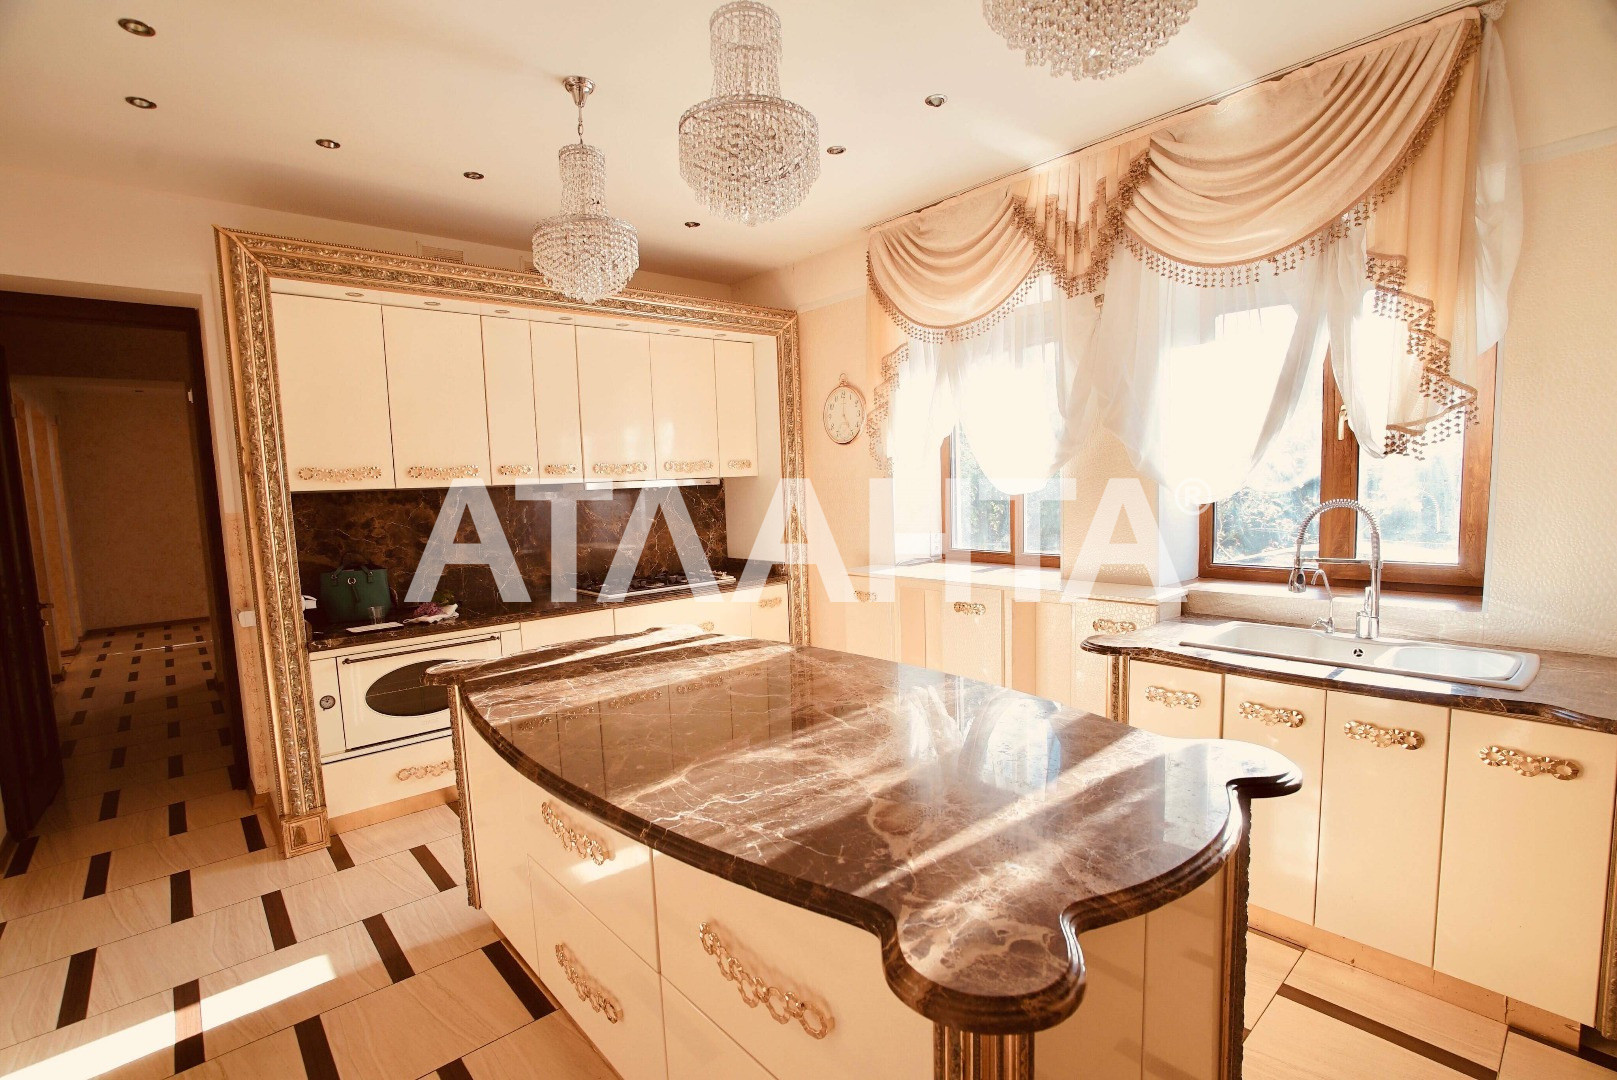 Продается Дом на ул. Средняя — 1 100 000 у.е. (фото №15)